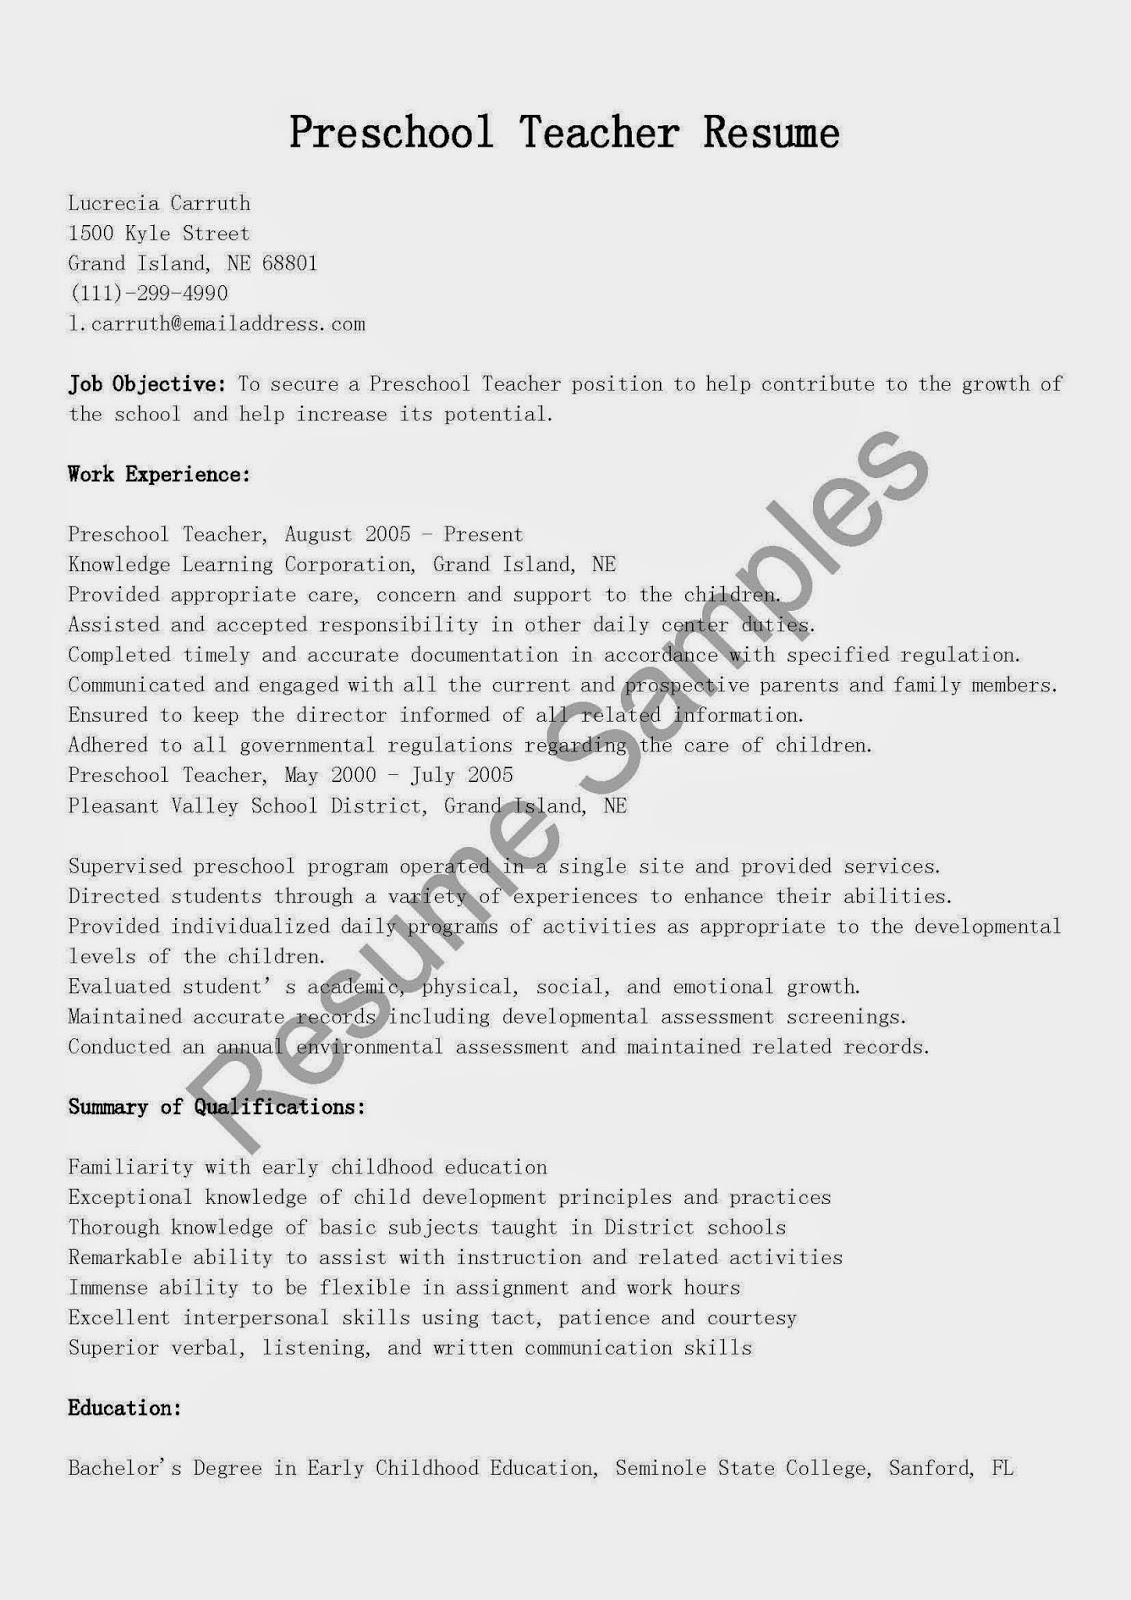 Teacher Resume Format Resume Samples Dyslexia Teacher Resume Sample